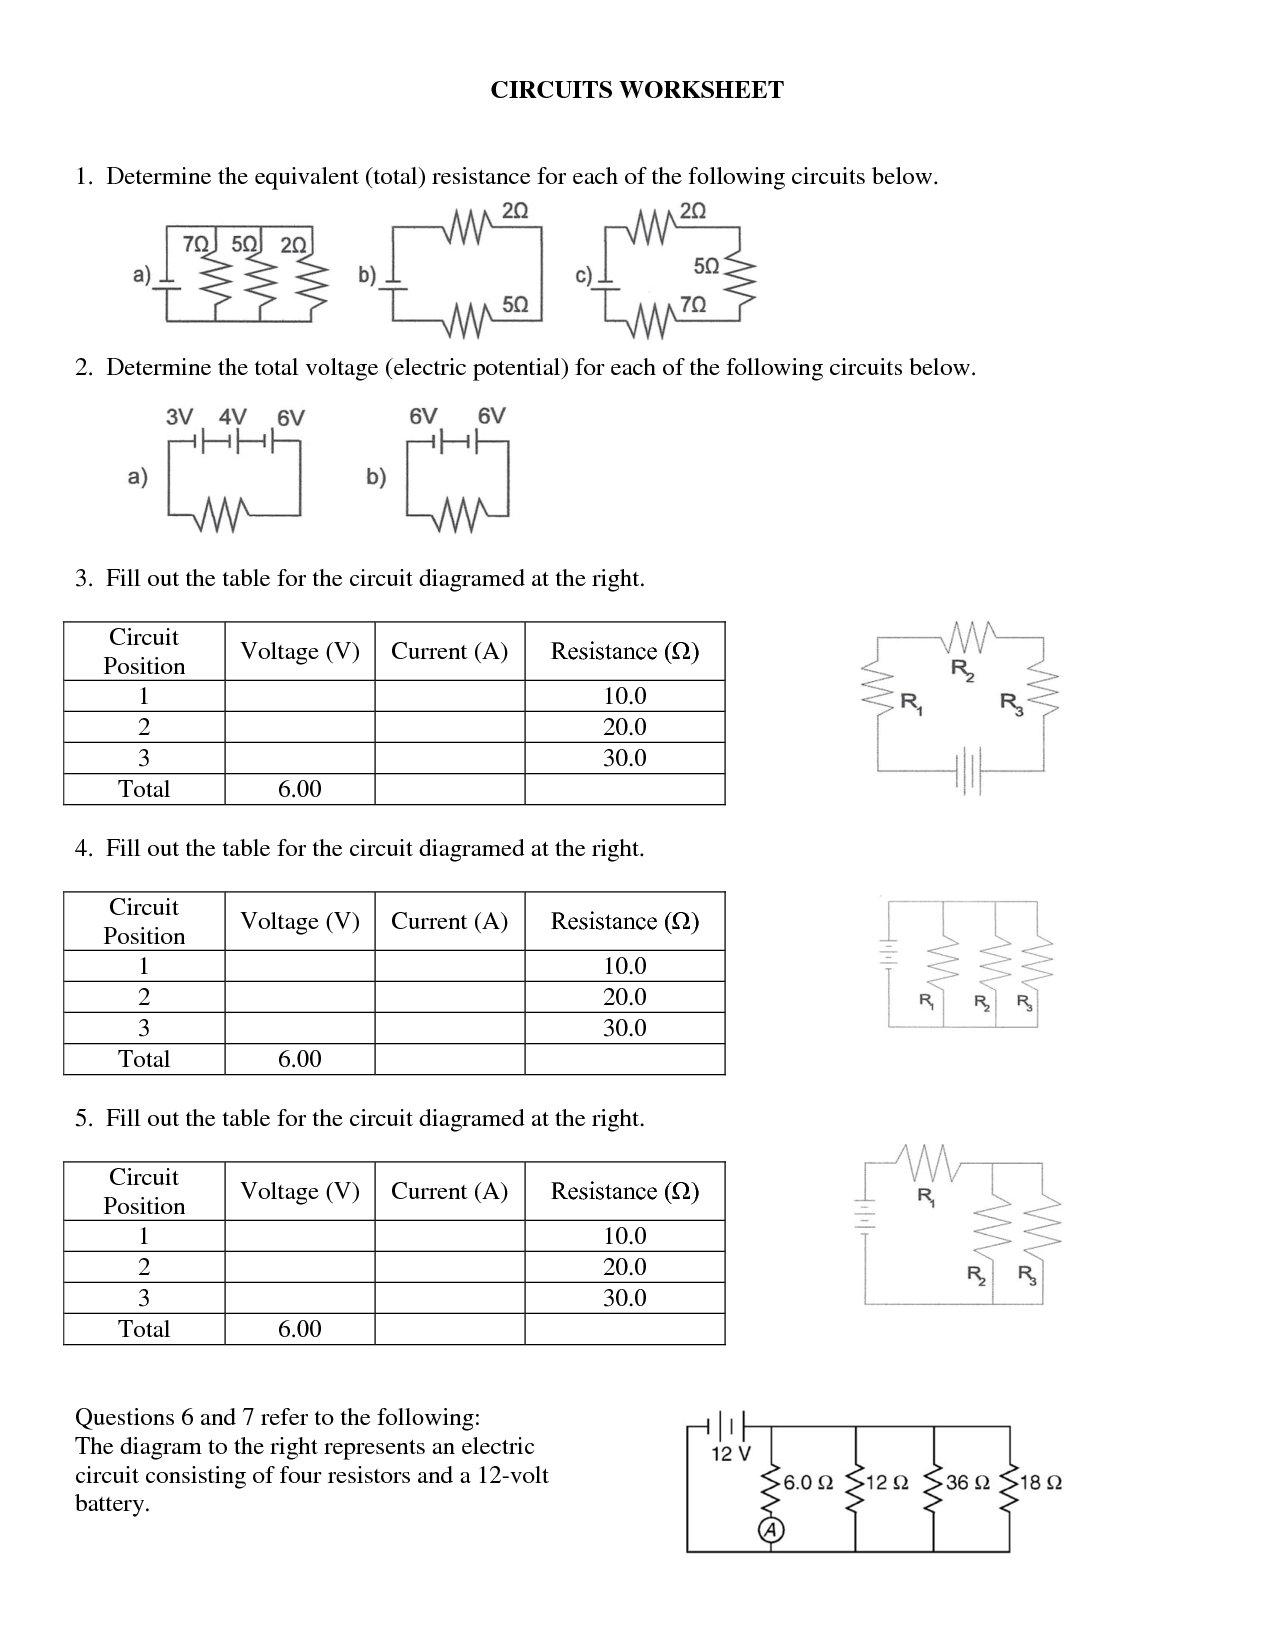 Circuits Worksheet Answer Key